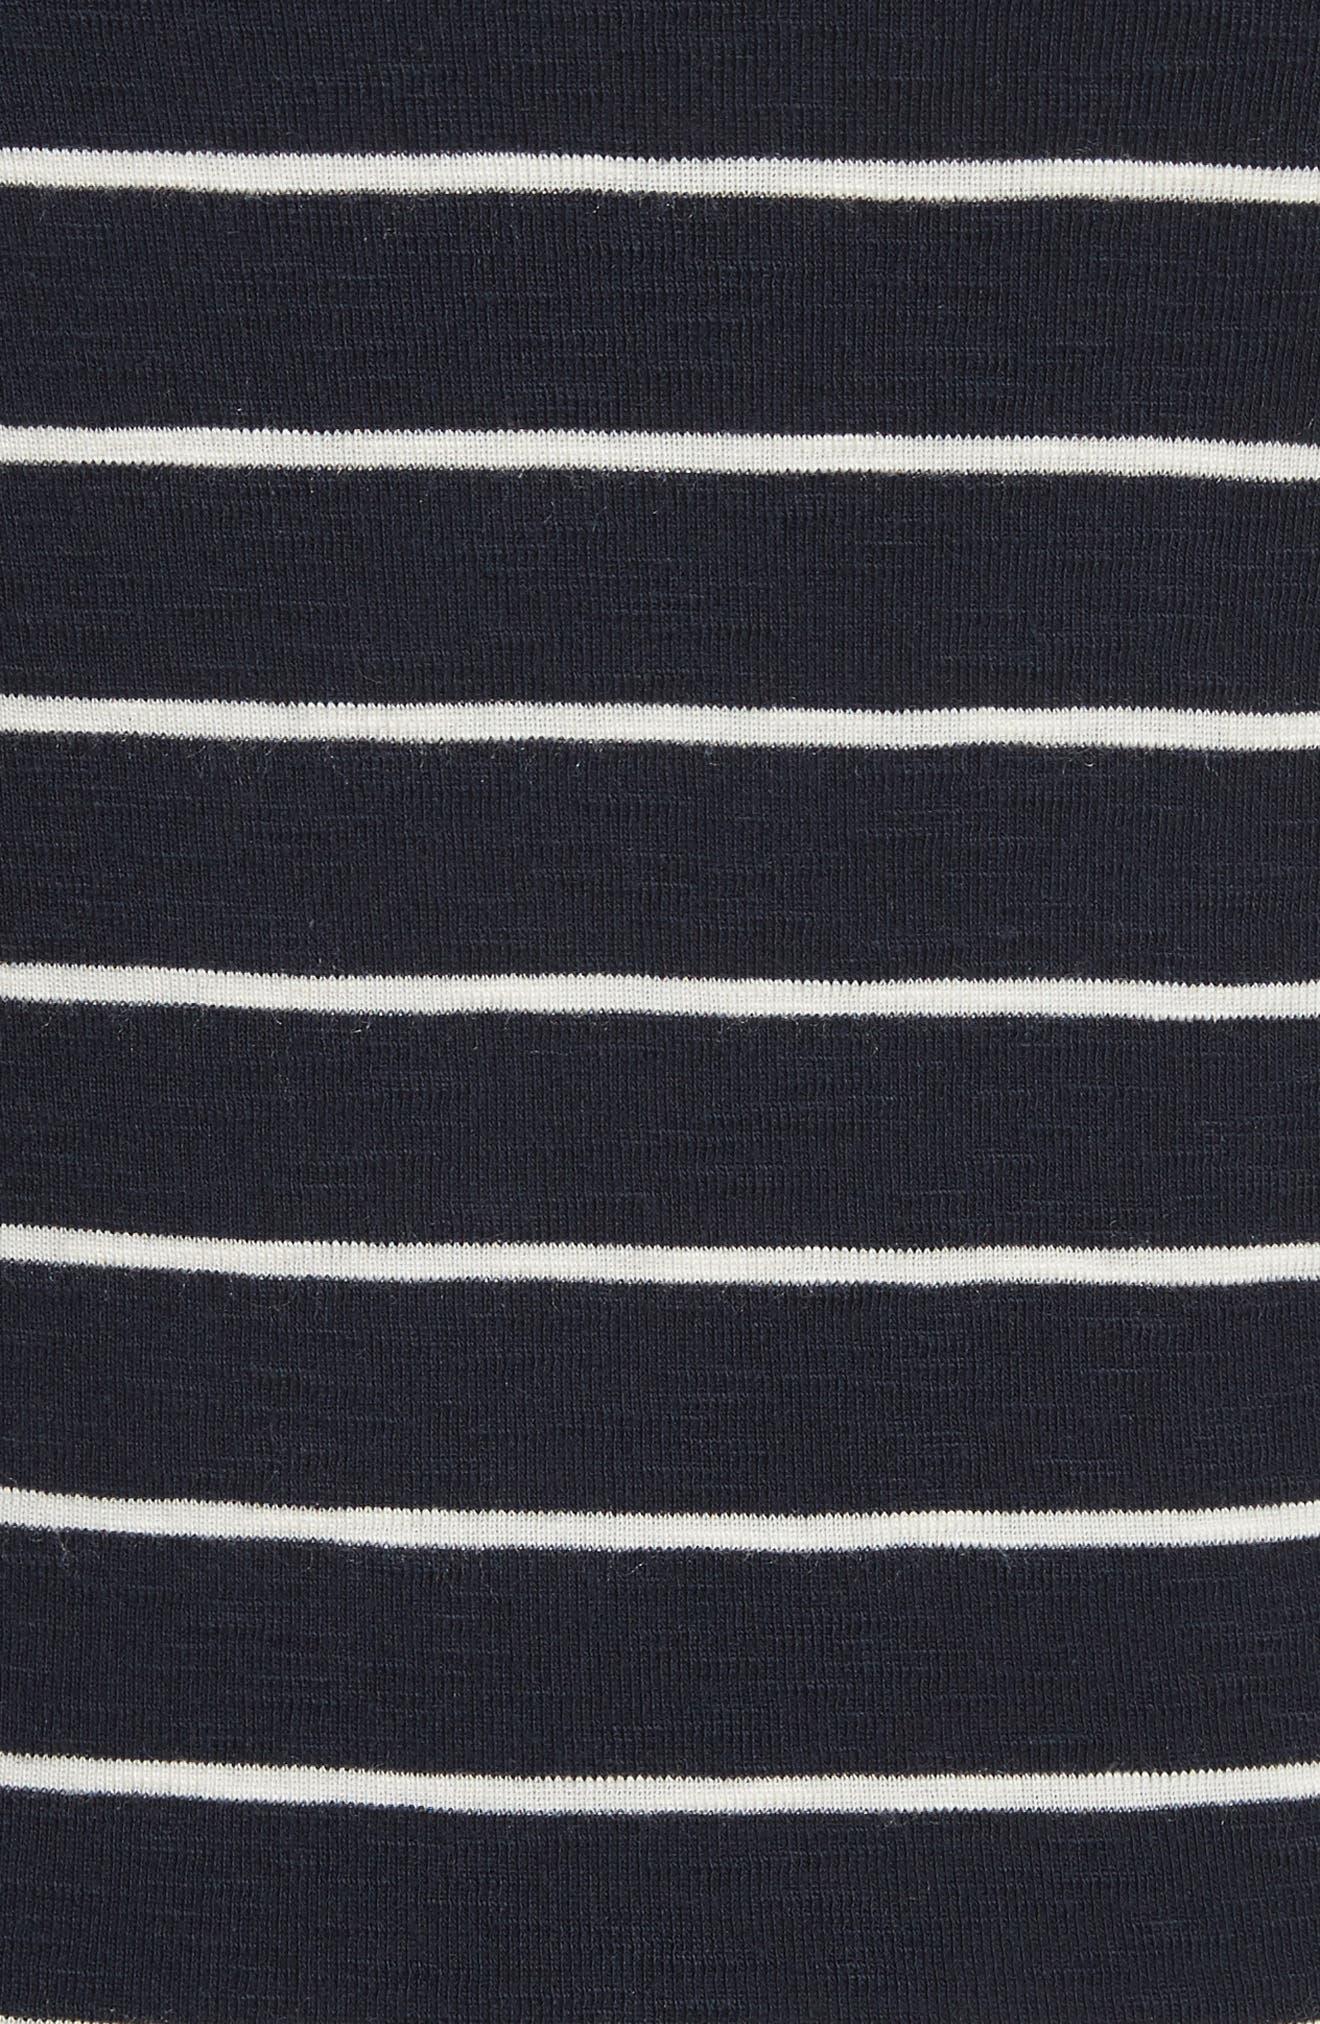 Chalk Stripe Fitted Crewneck Tee,                             Alternate thumbnail 5, color,                             Coastal/ Off White